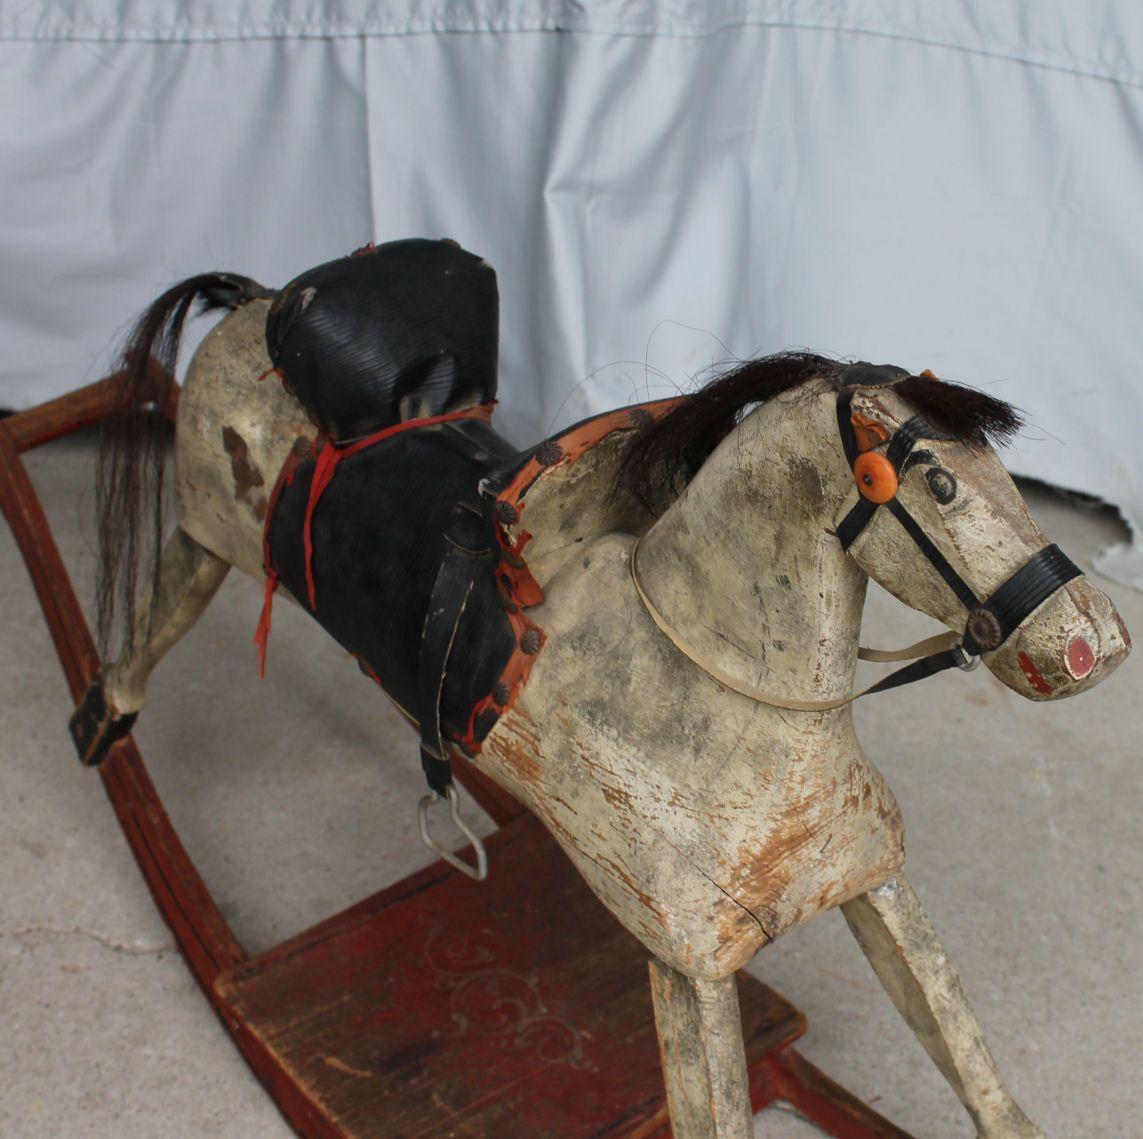 Antique Rocking Horses For Sale | Furniture > Antique Primitive Wooden Rocking Horse